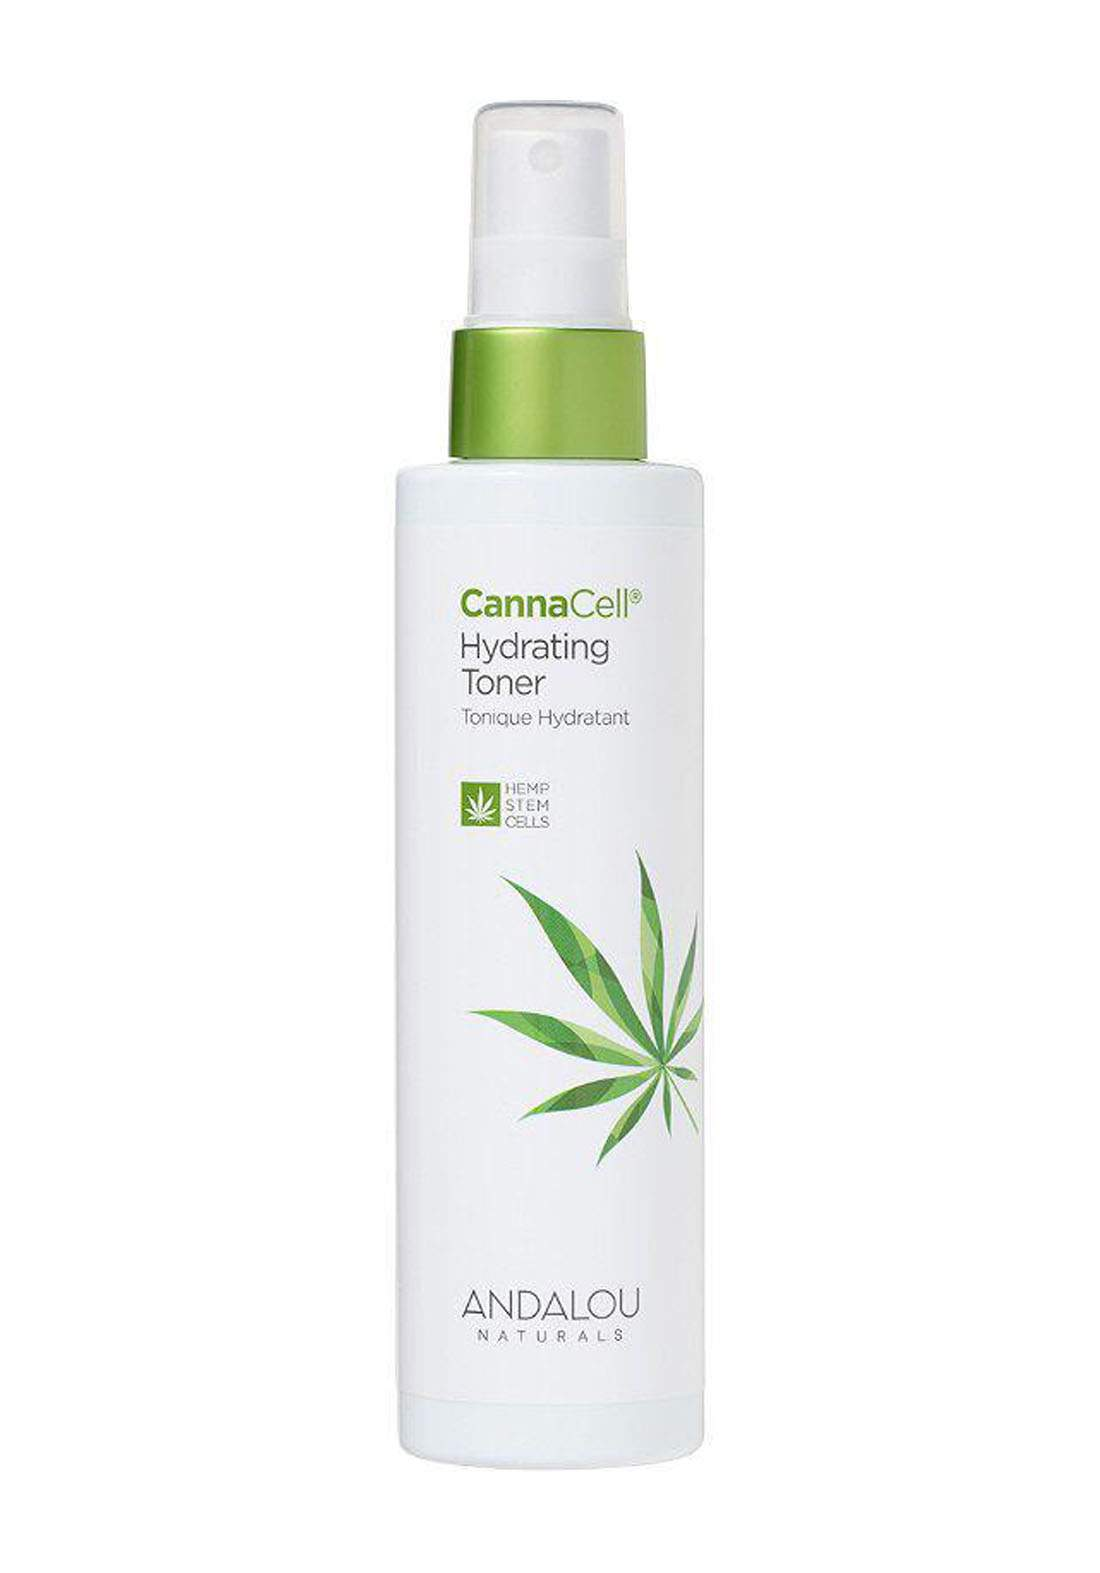 Andalou 7118 Naturals Cannacell Hydrating Toner  200 Ml تونر للبشرة